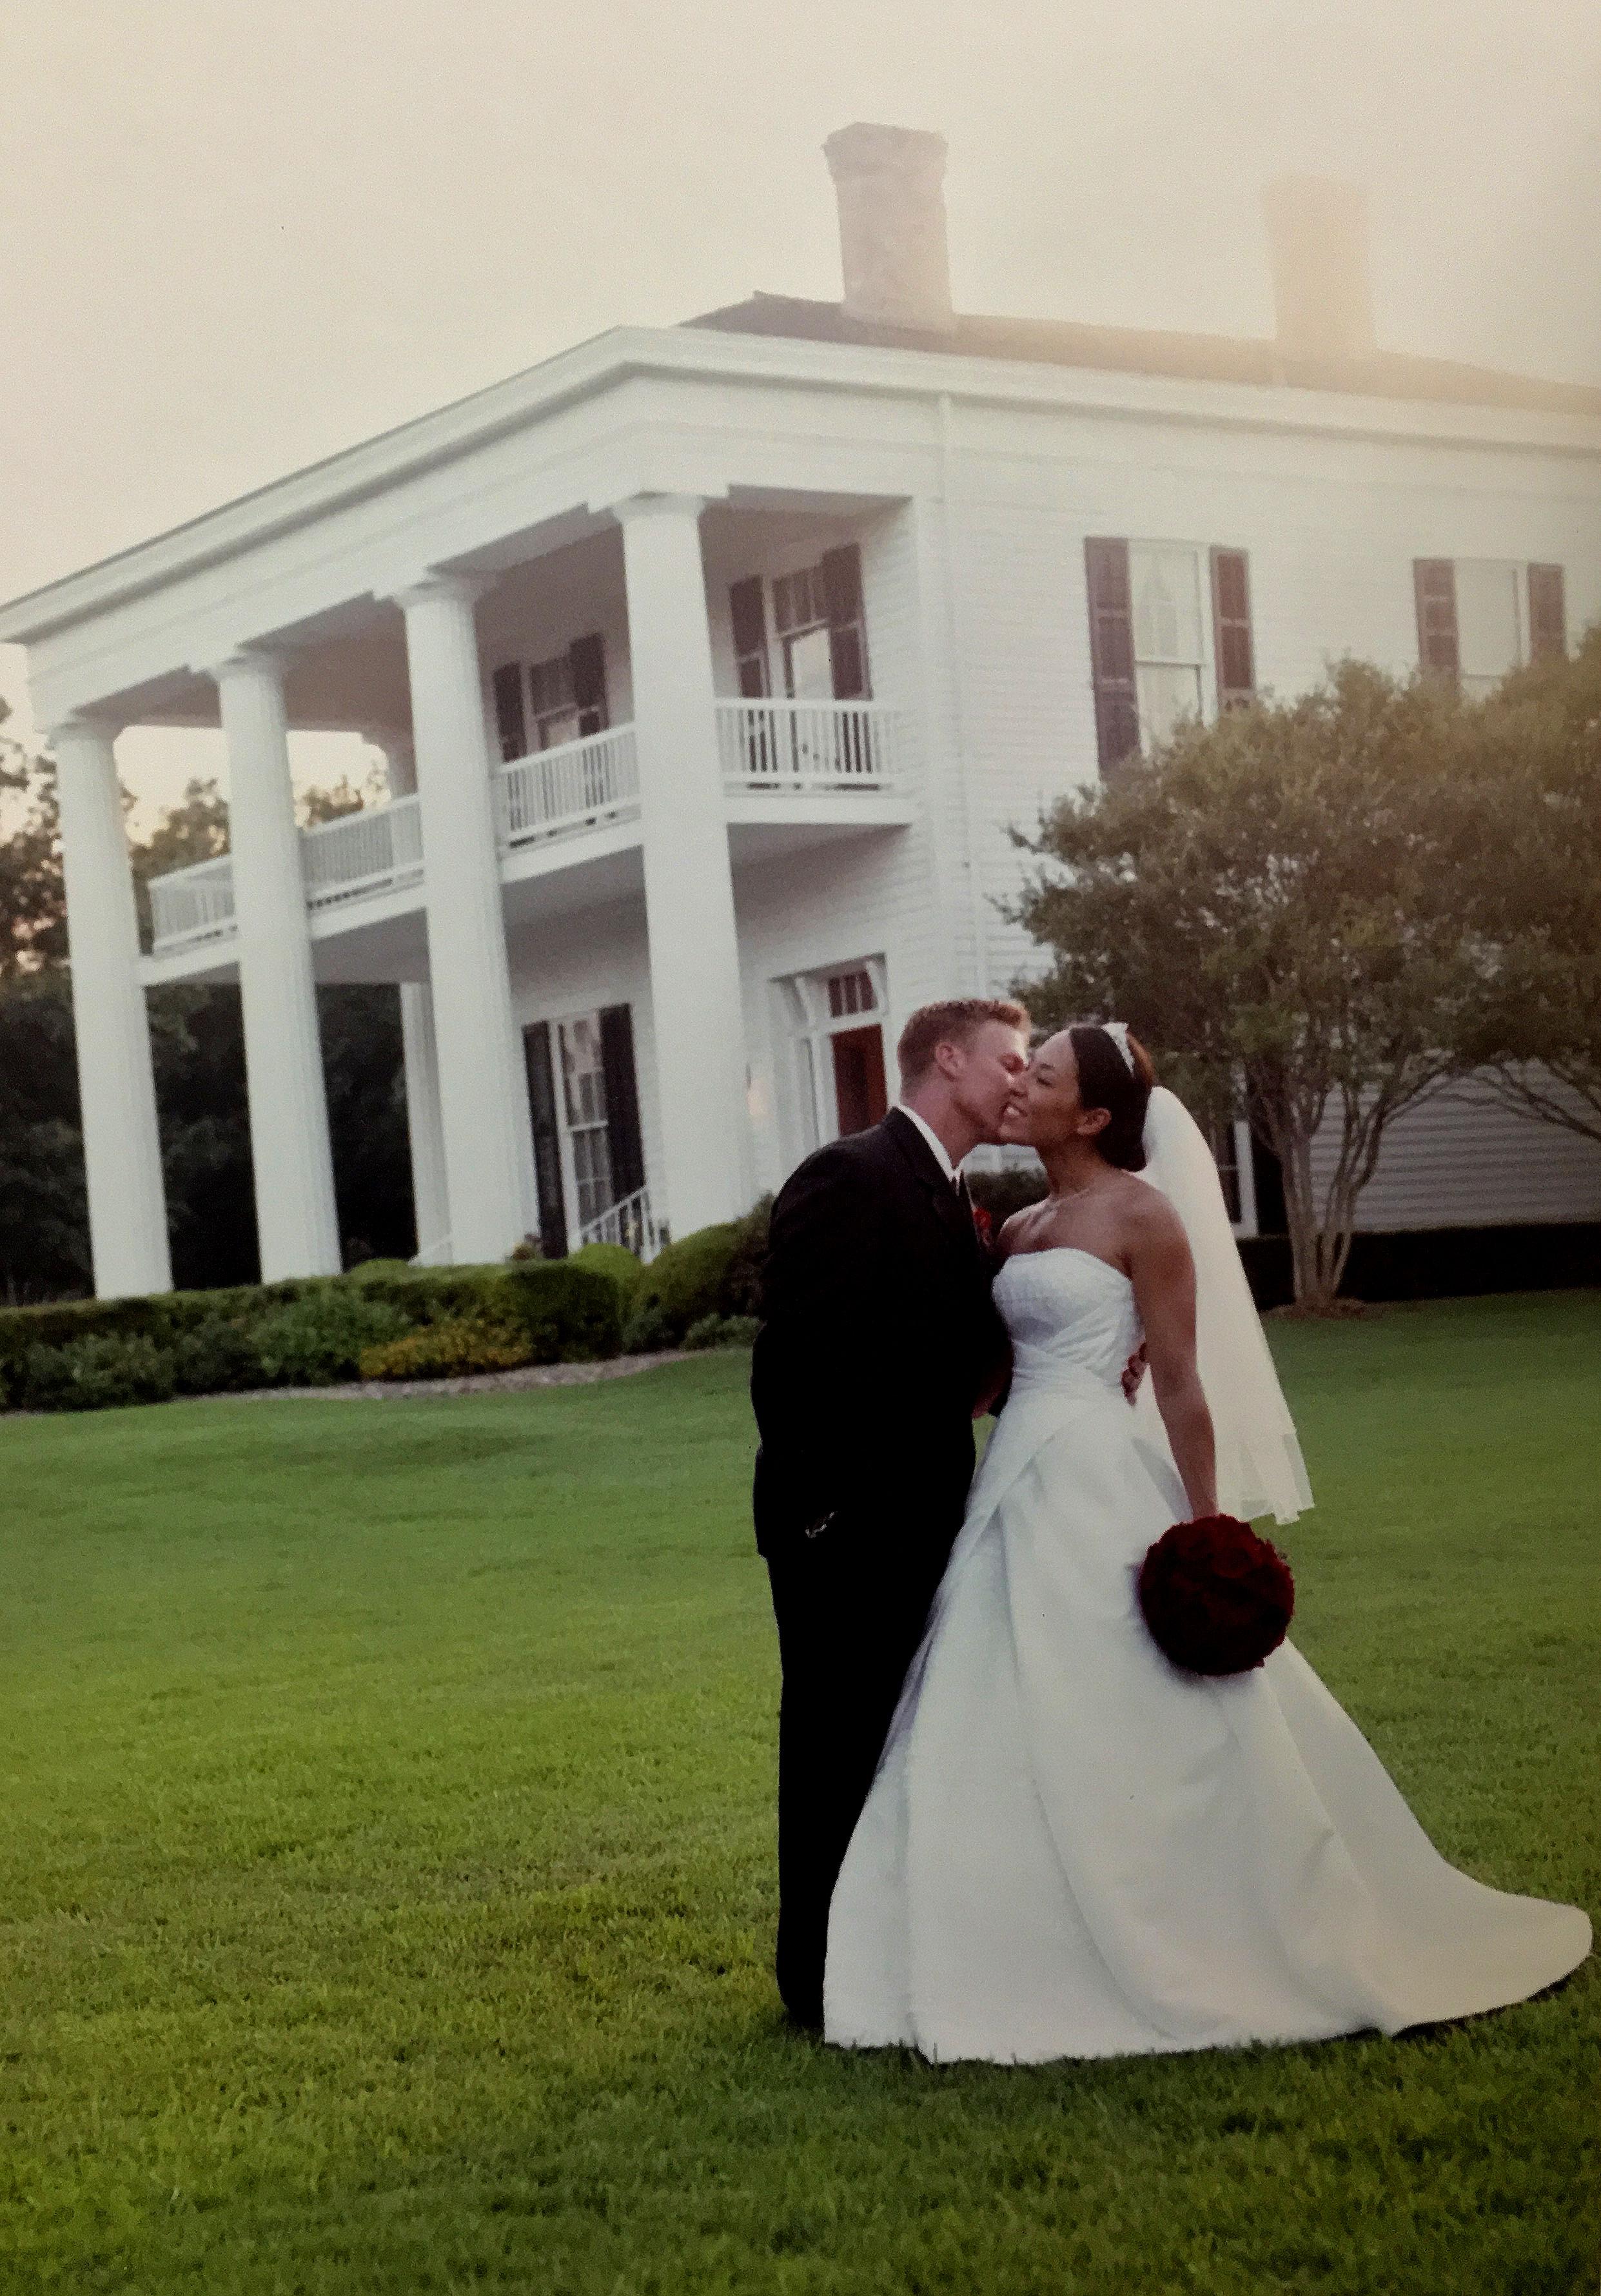 Fullsize Of Joanna Gaines Wedding Ring